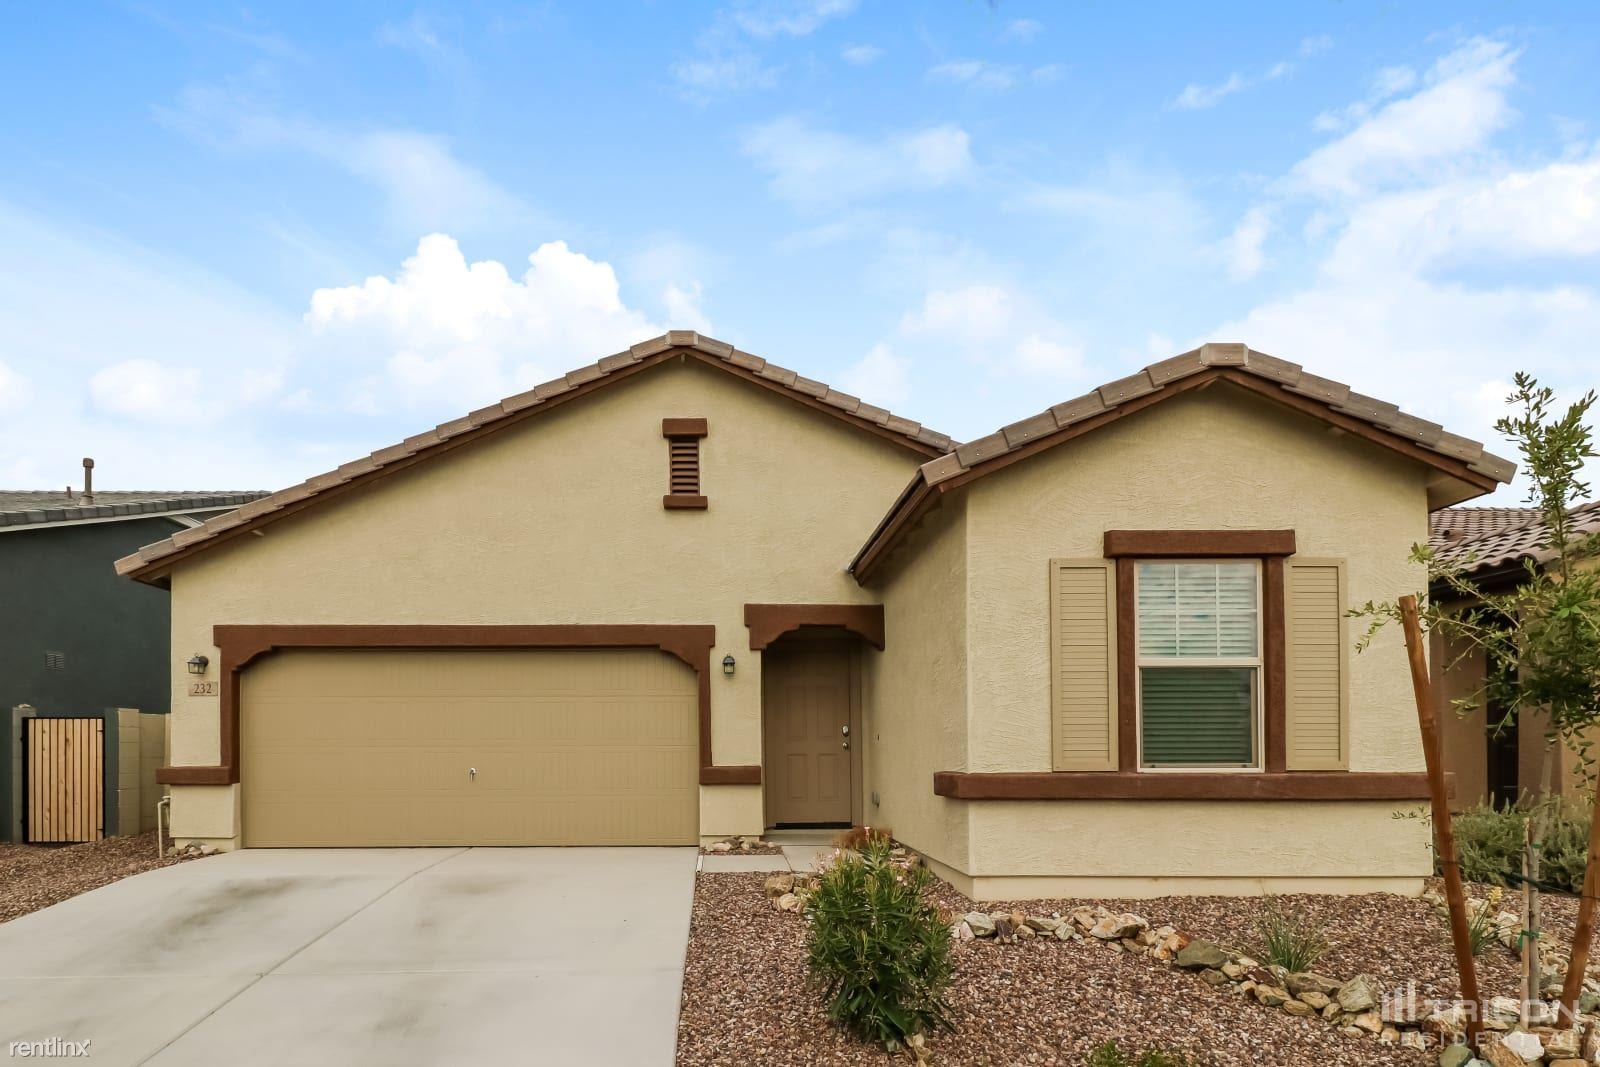 232 N 202nd Lane, Buckeye, AZ - 2,299 USD/ month